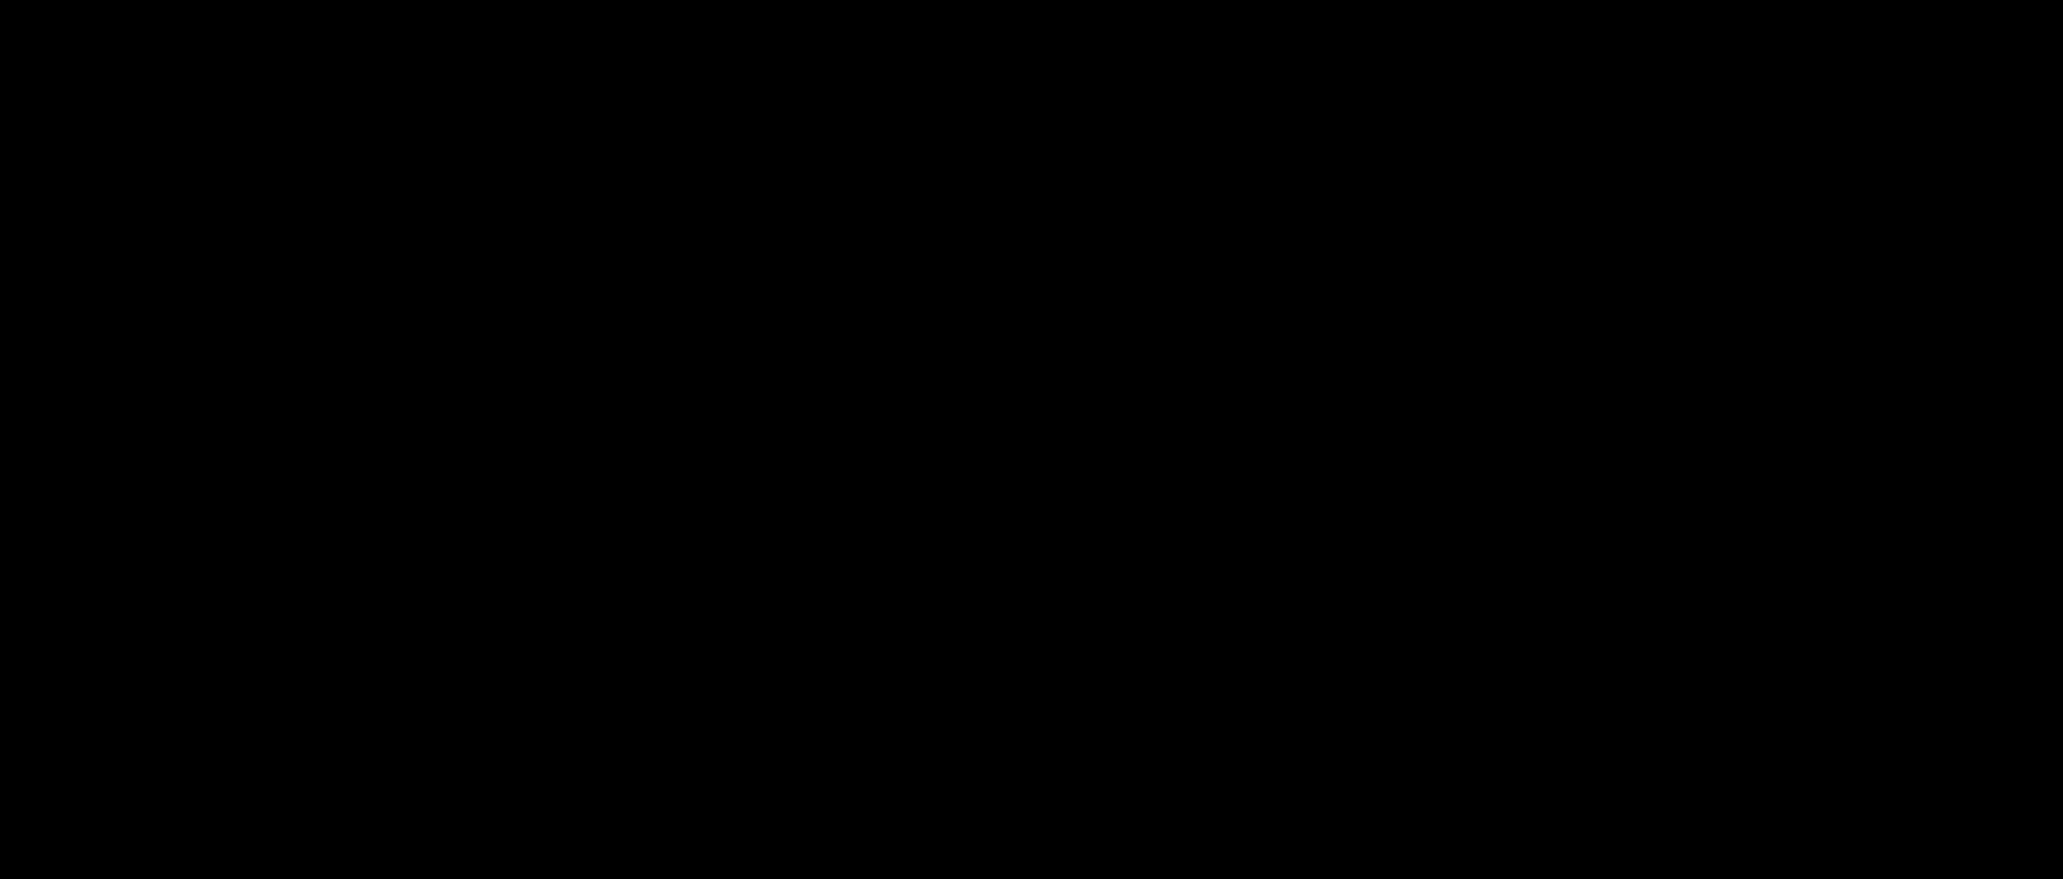 humancap1